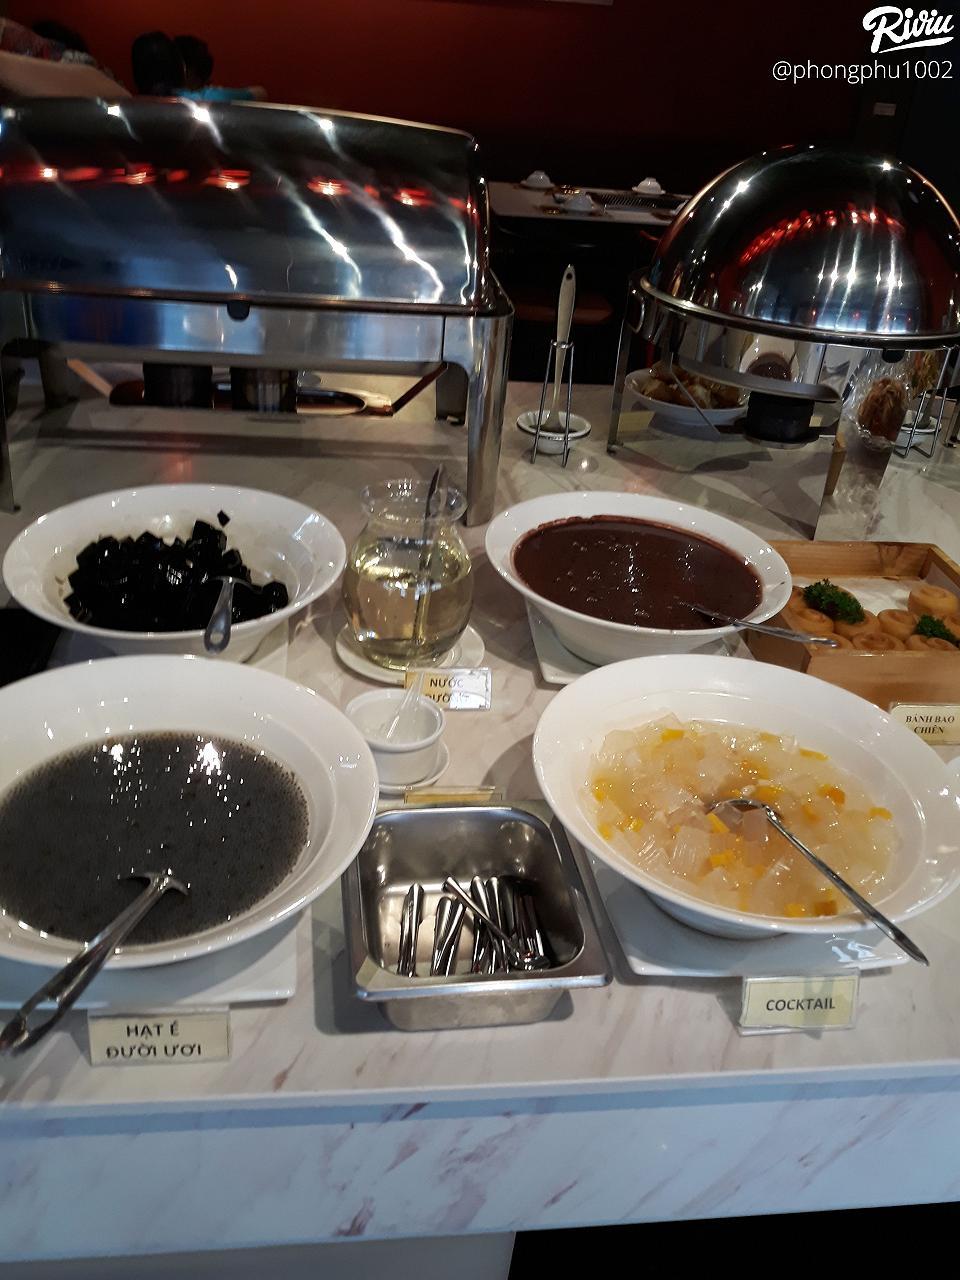 10* cho buffet lau nuong 180k sik dak food - anh 7